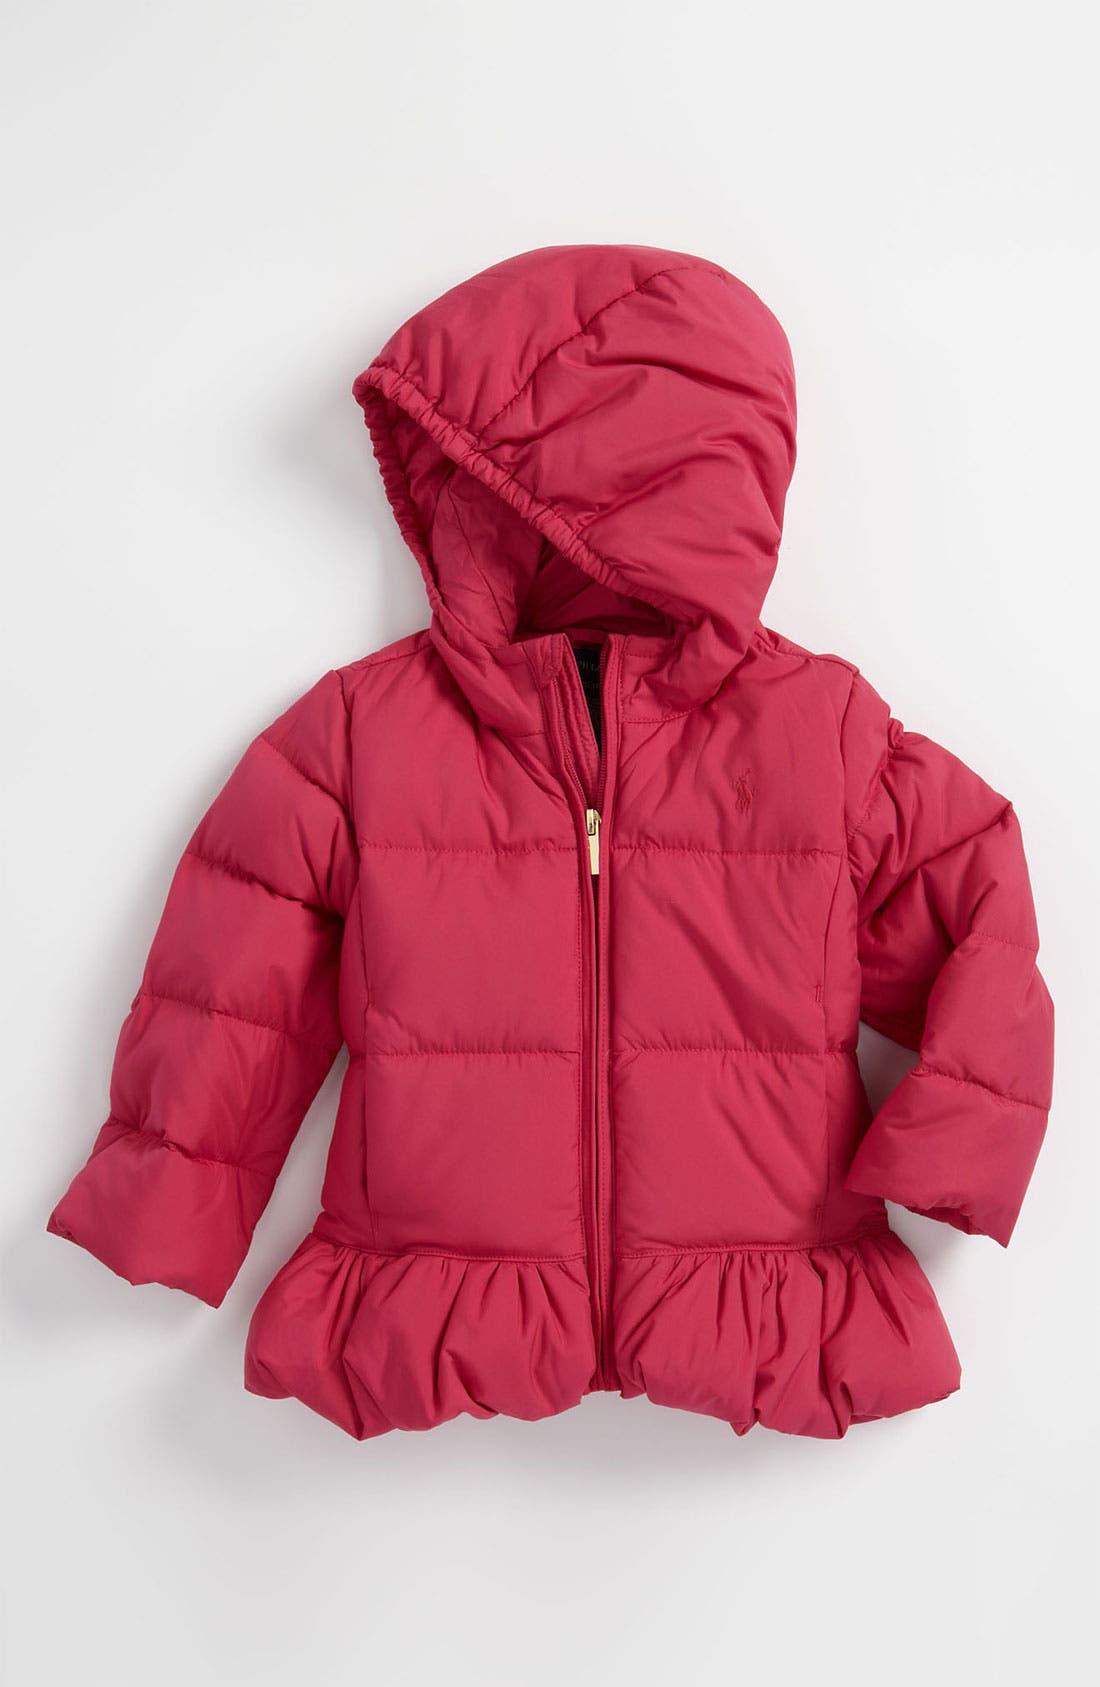 Main Image - Ralph Lauren Hooded Down Puffer Jacket (Toddler)